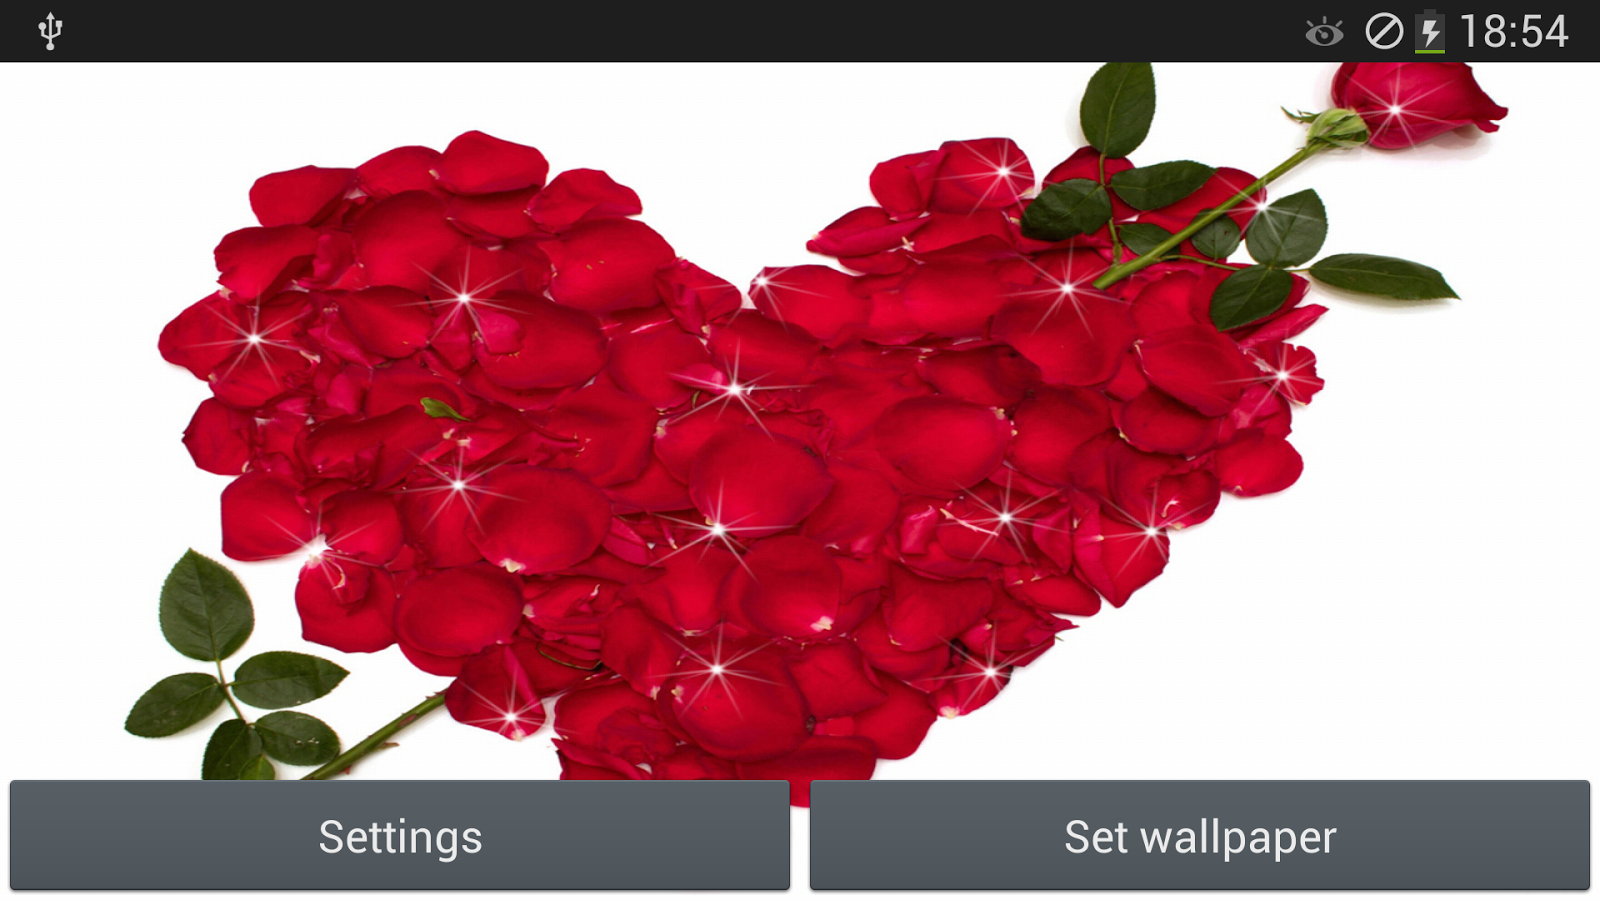 Wallpaper download karne wala apps - Rose Live Wallpaper Screenshot